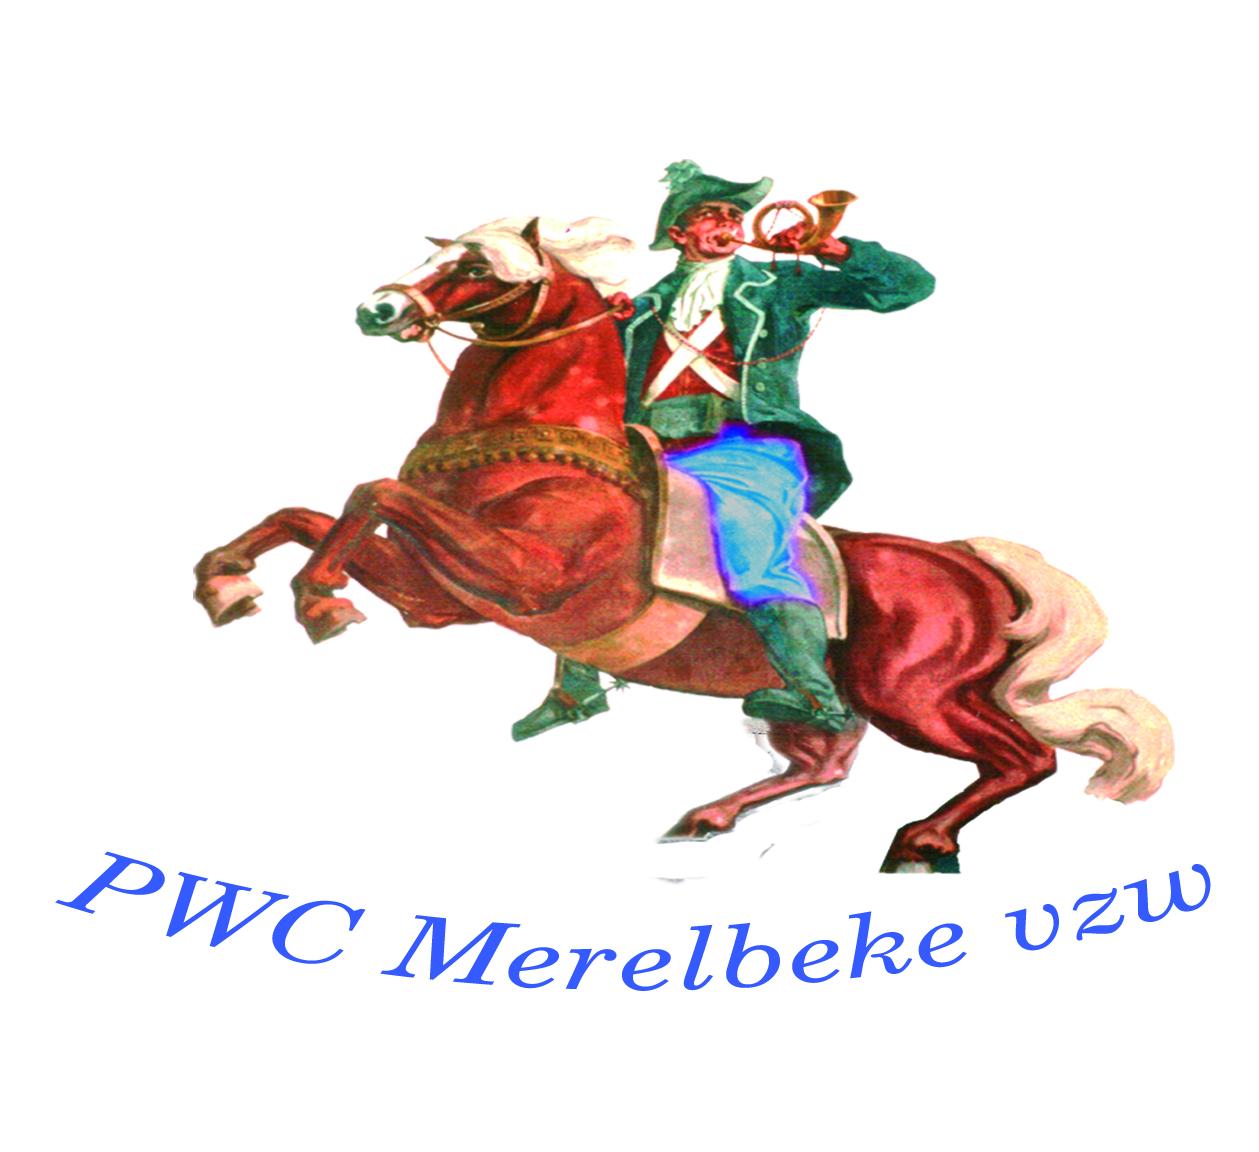 Postiljon Wandelclub Merelbeke vzw